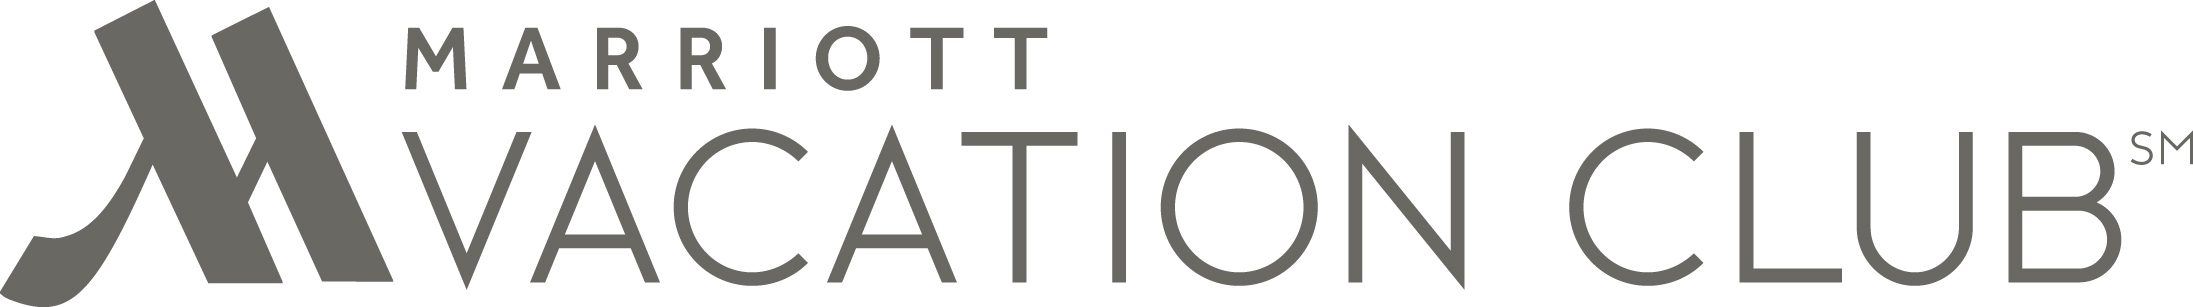 Marriott Vacation Club, Asia-Pacific logo